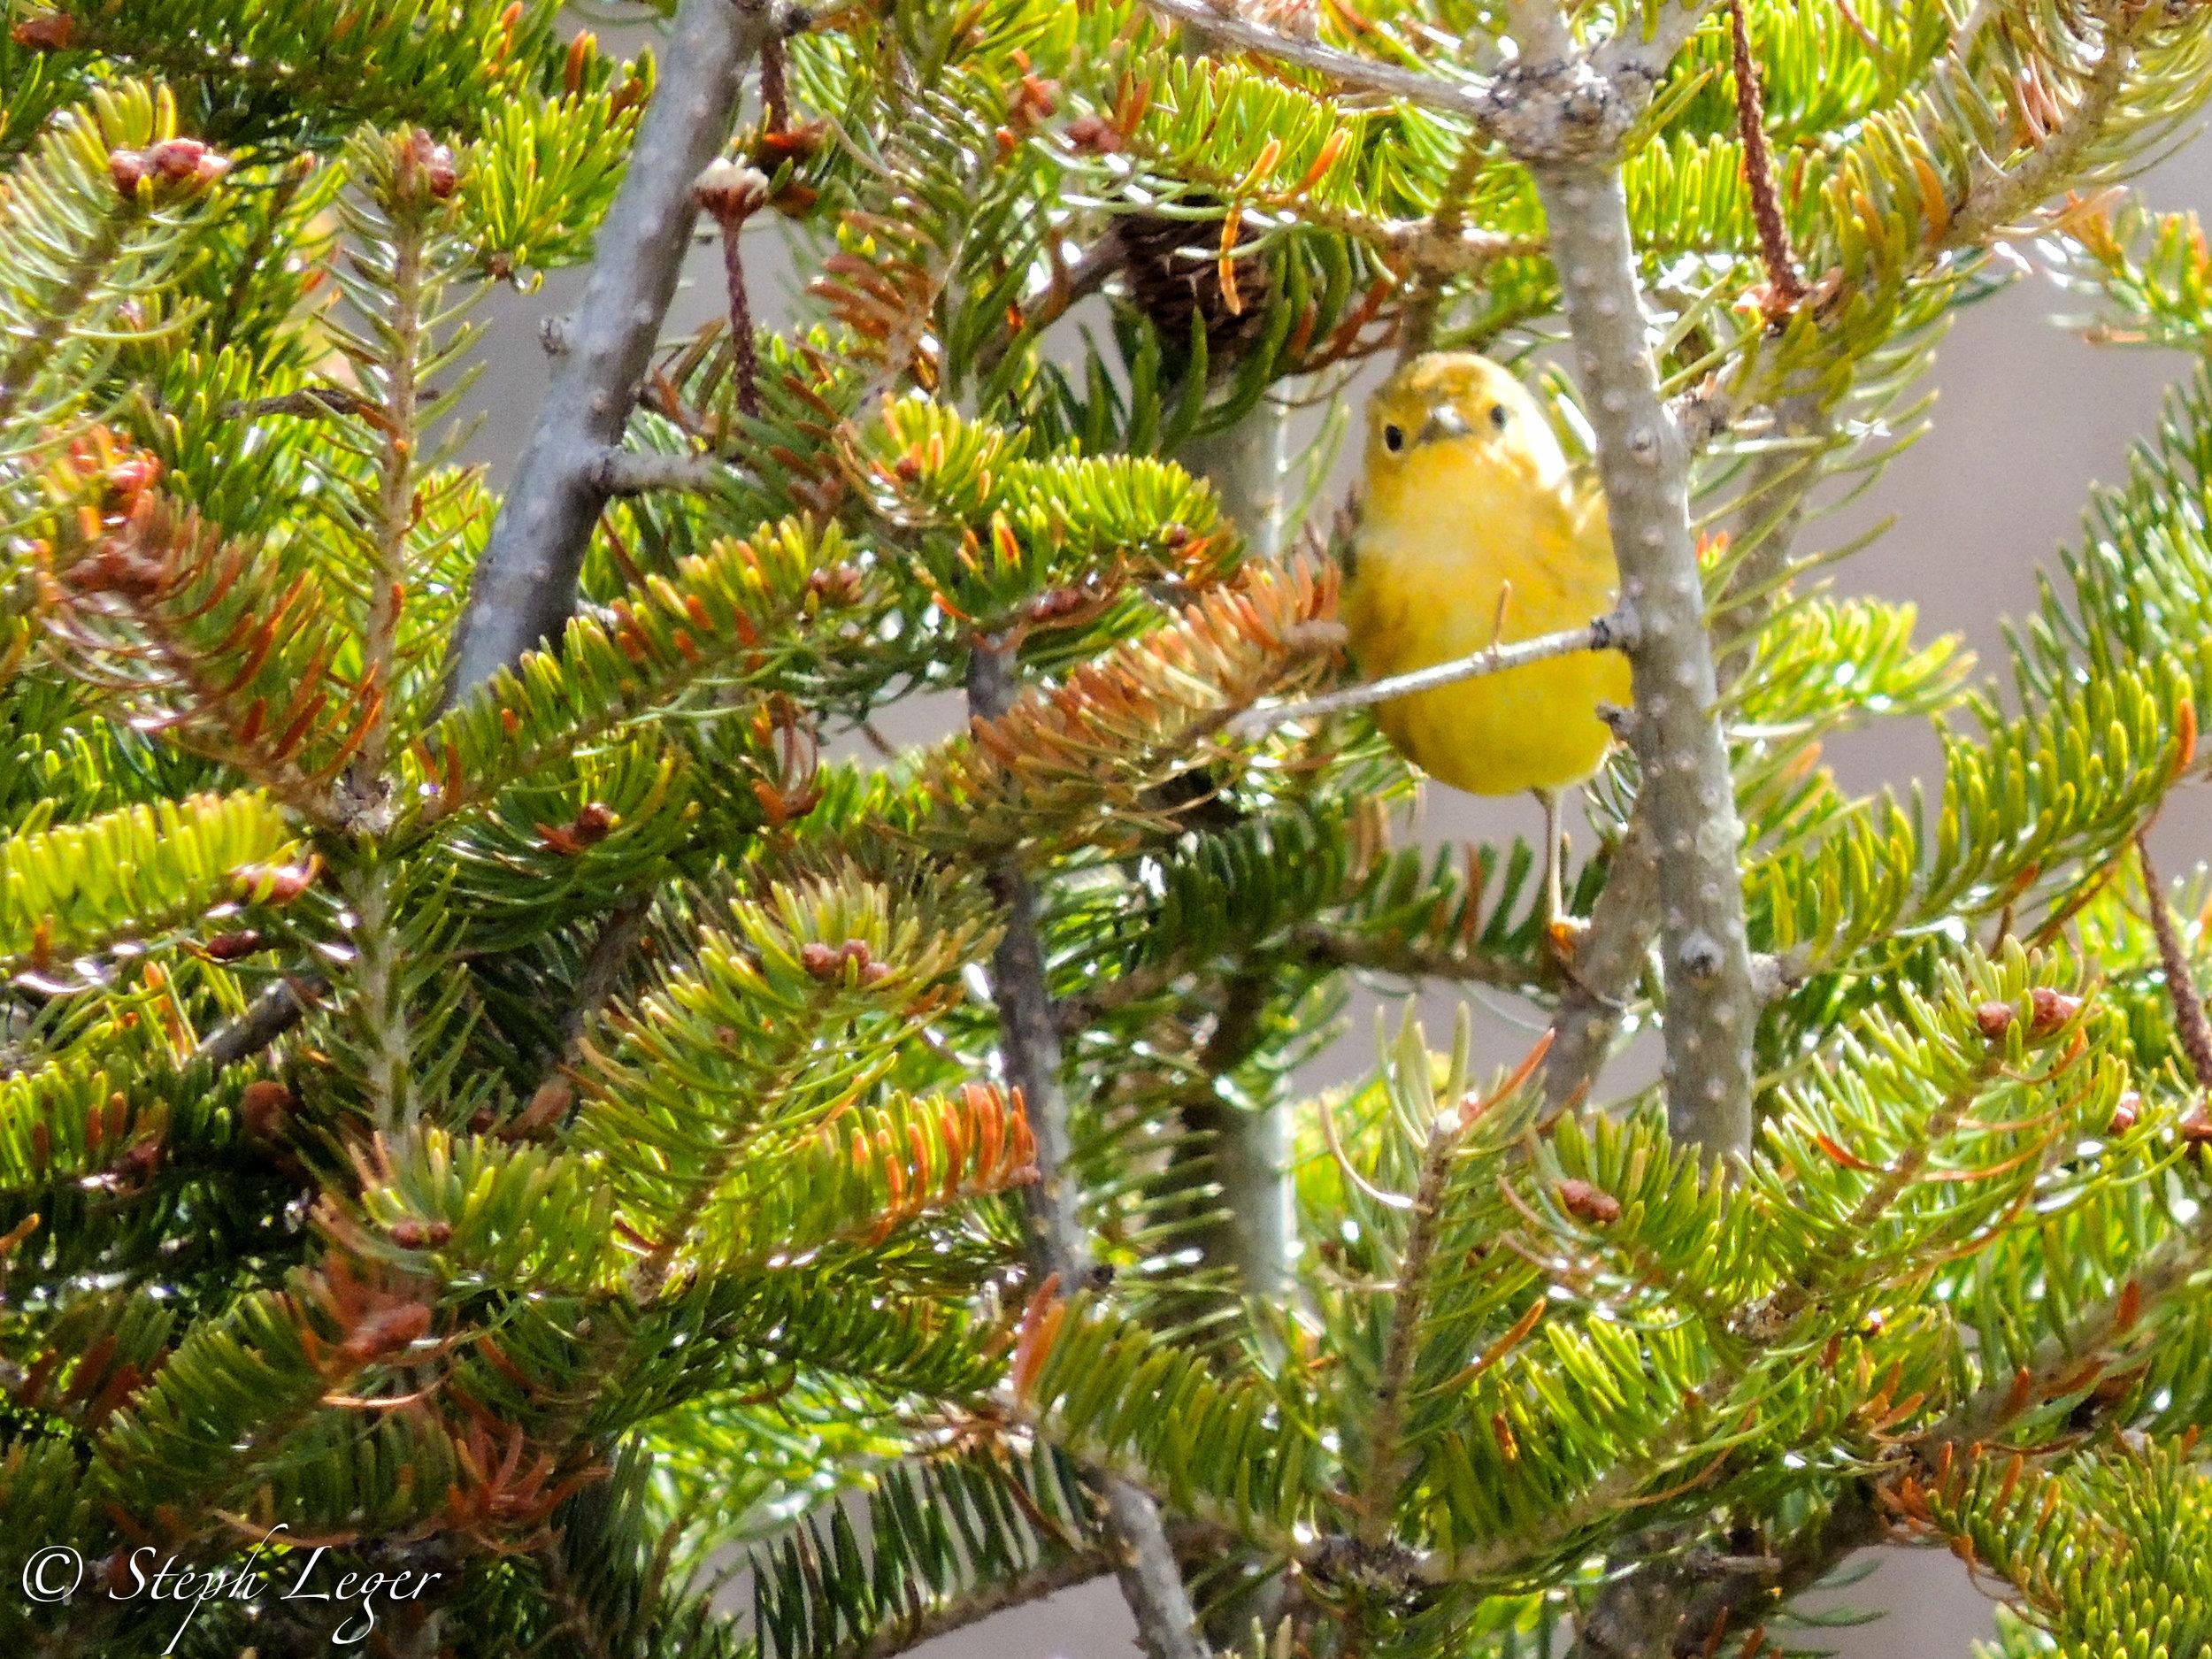 Pine Warbler ( Setophaga pinus ) - Terra Nova National Park, Newfoundland